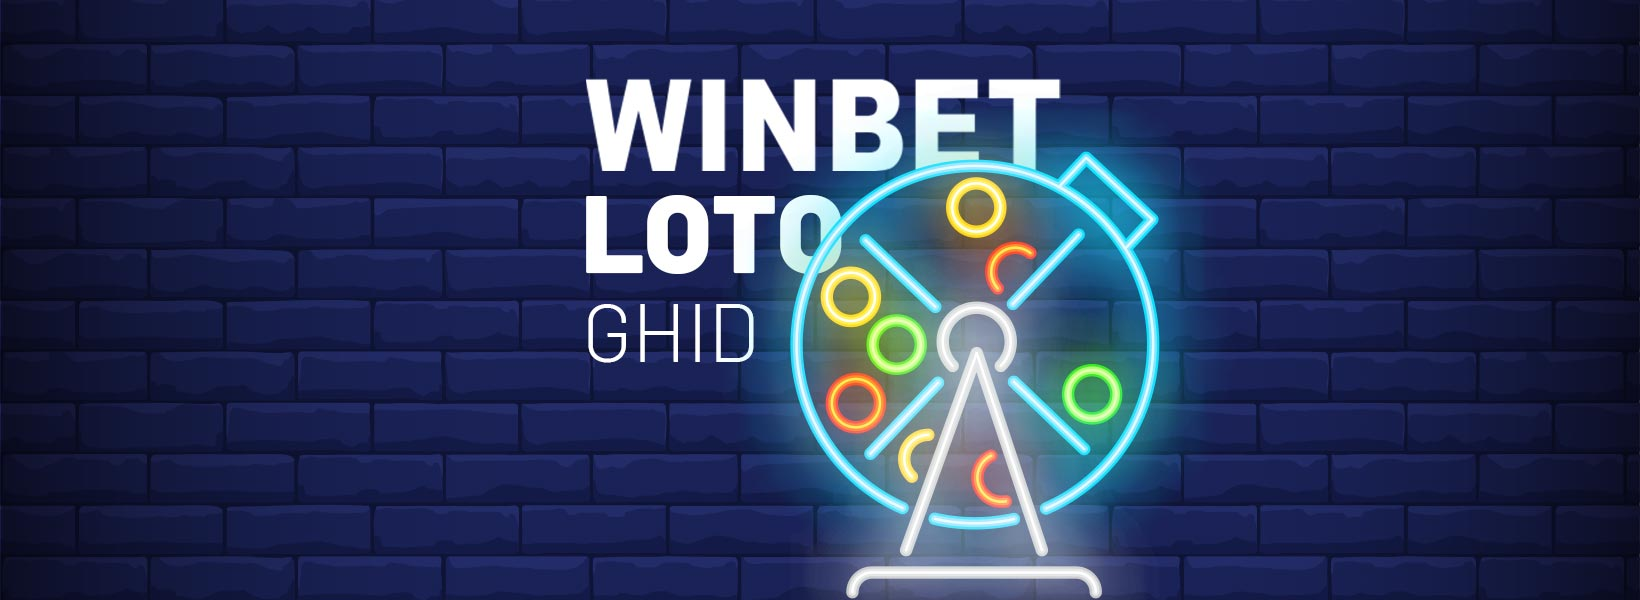 winbet loto